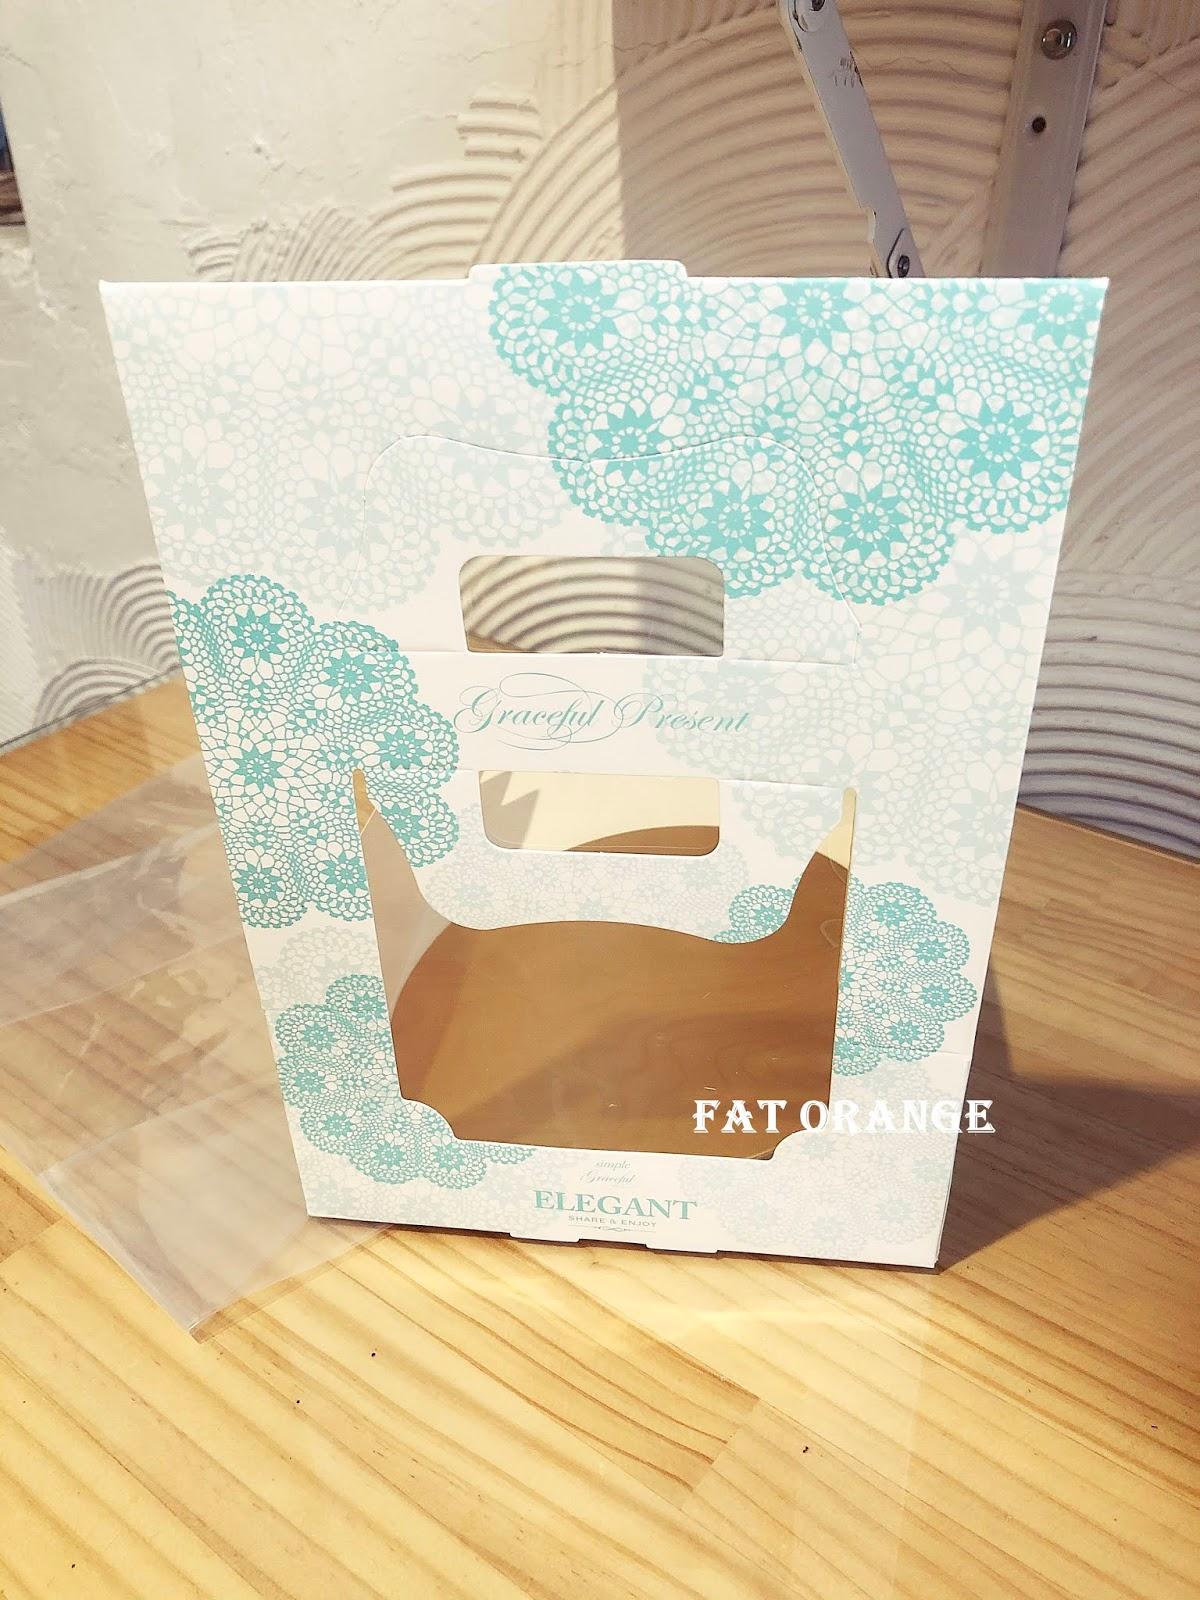 樂焙DIY Funbaking x 戚風蛋糕 - FAT ORANGE